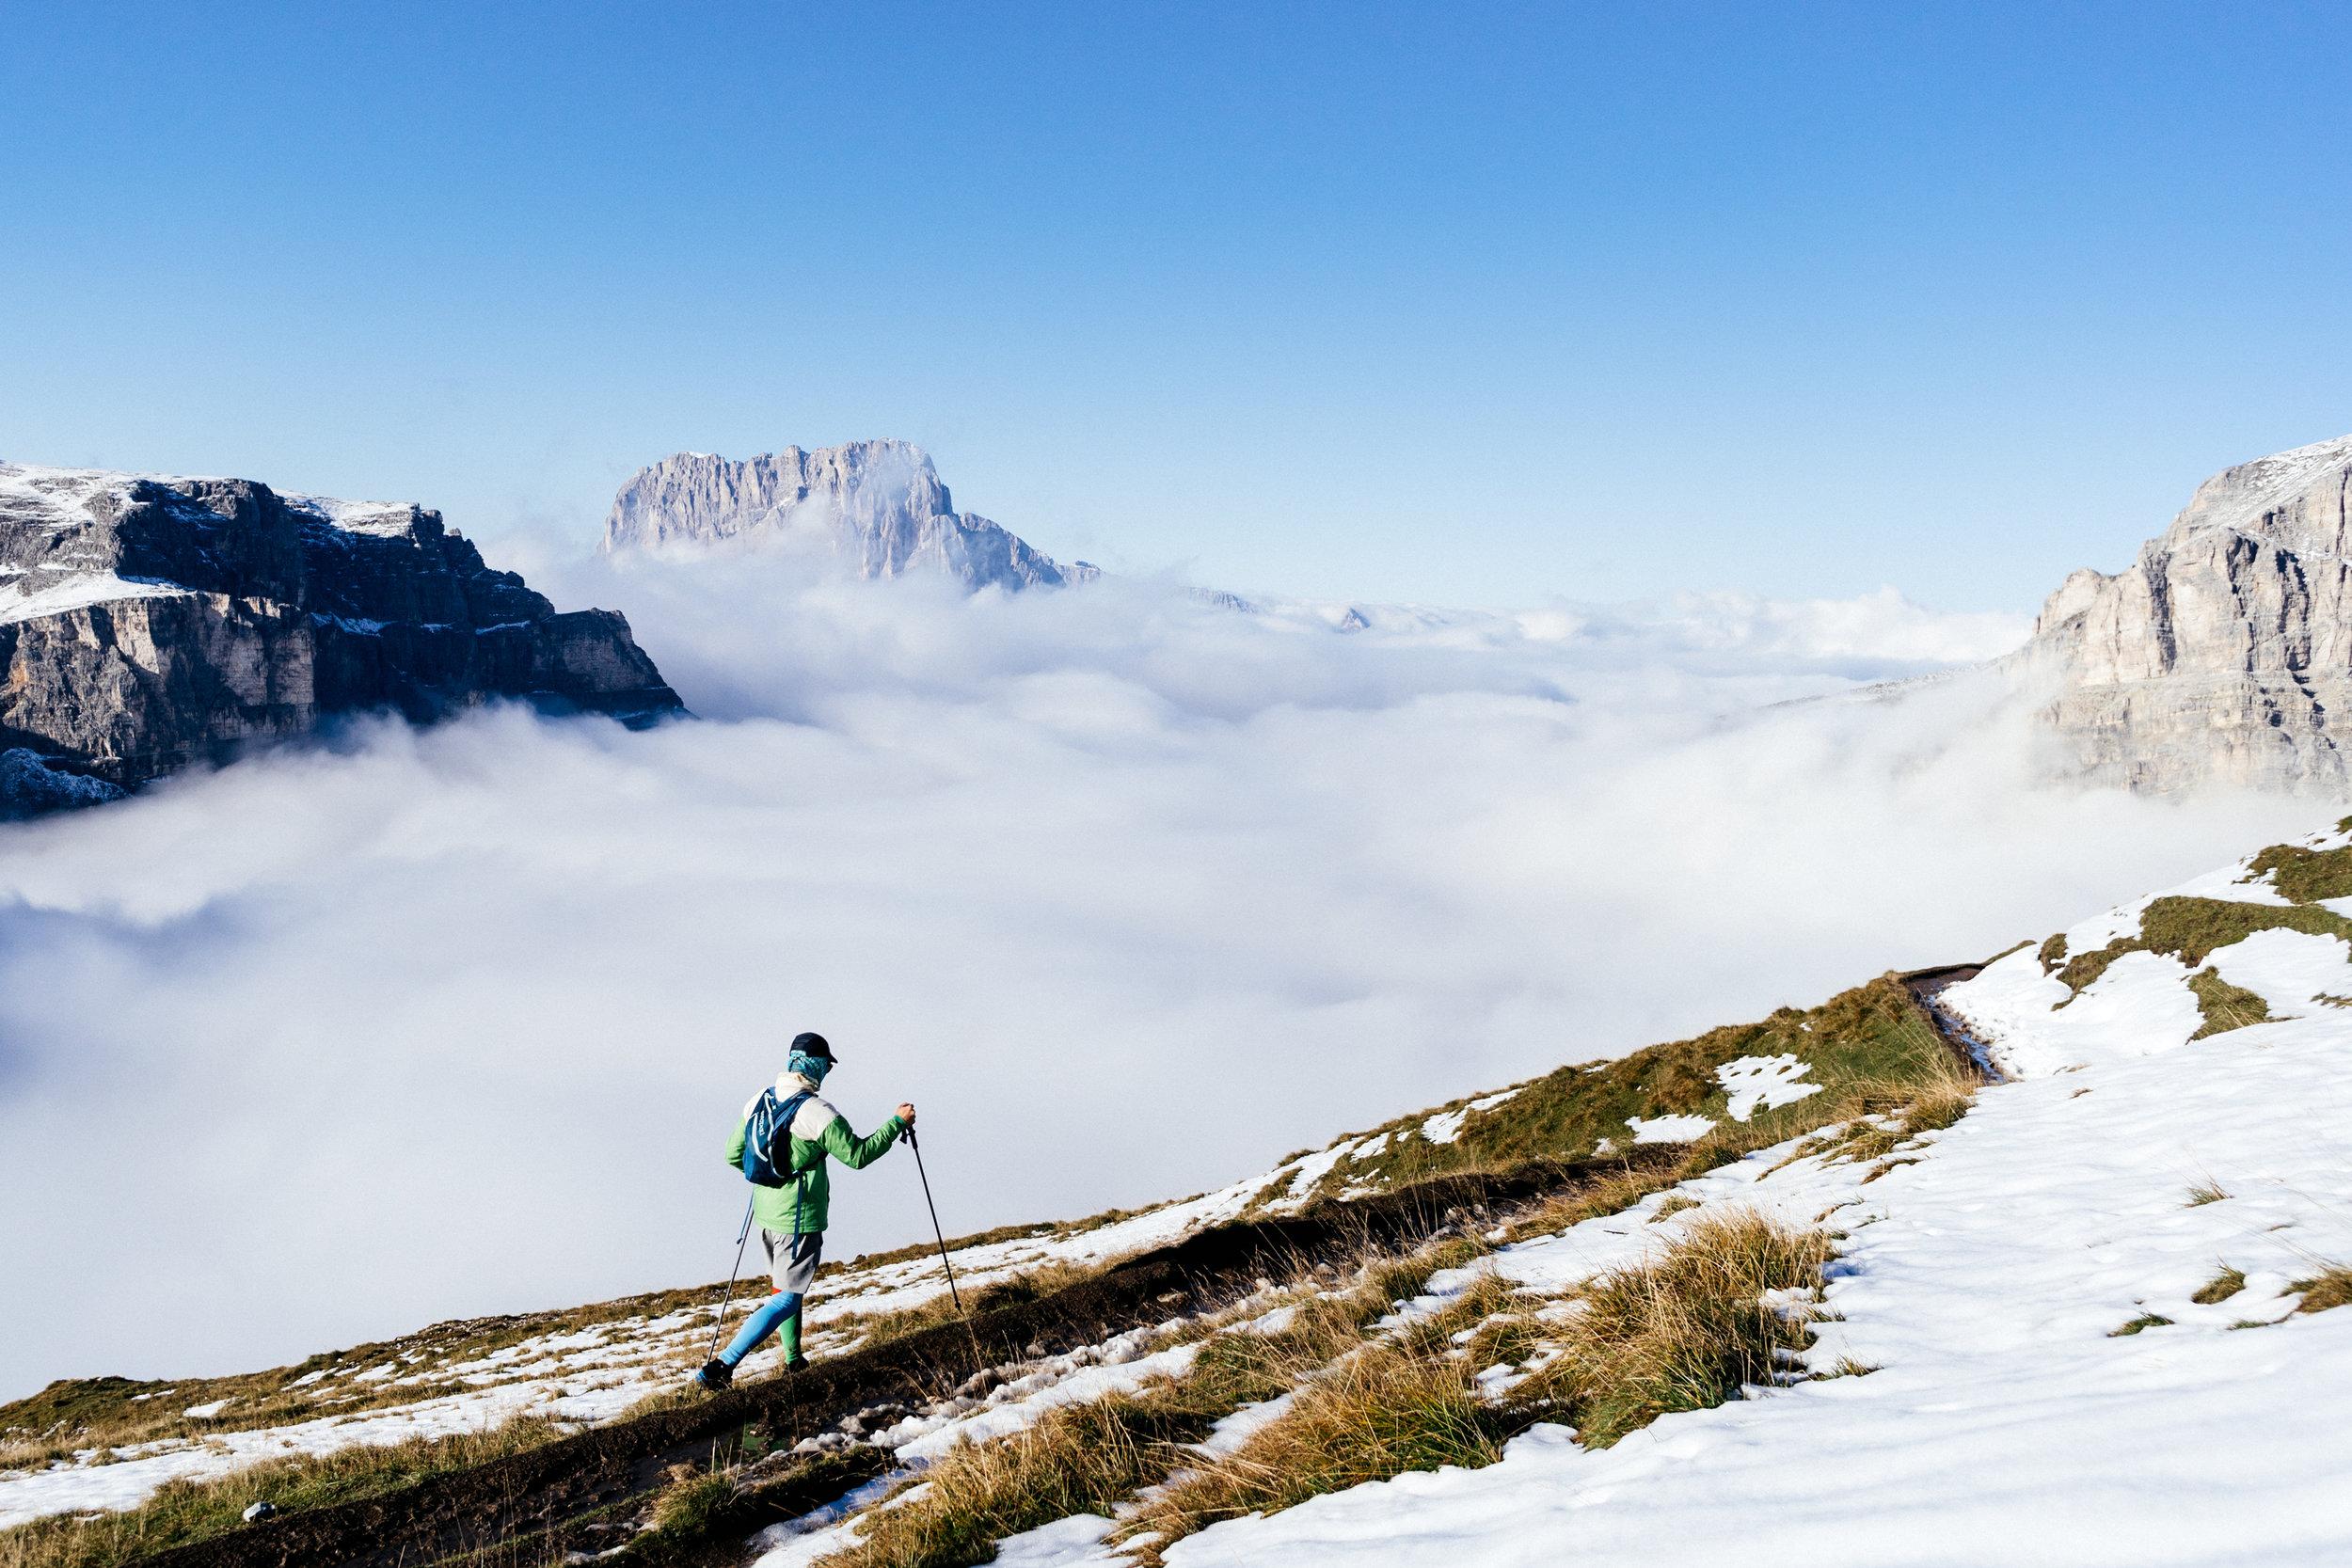 Dolomites-ChrisBrinleeJr-SEP17-107.jpg